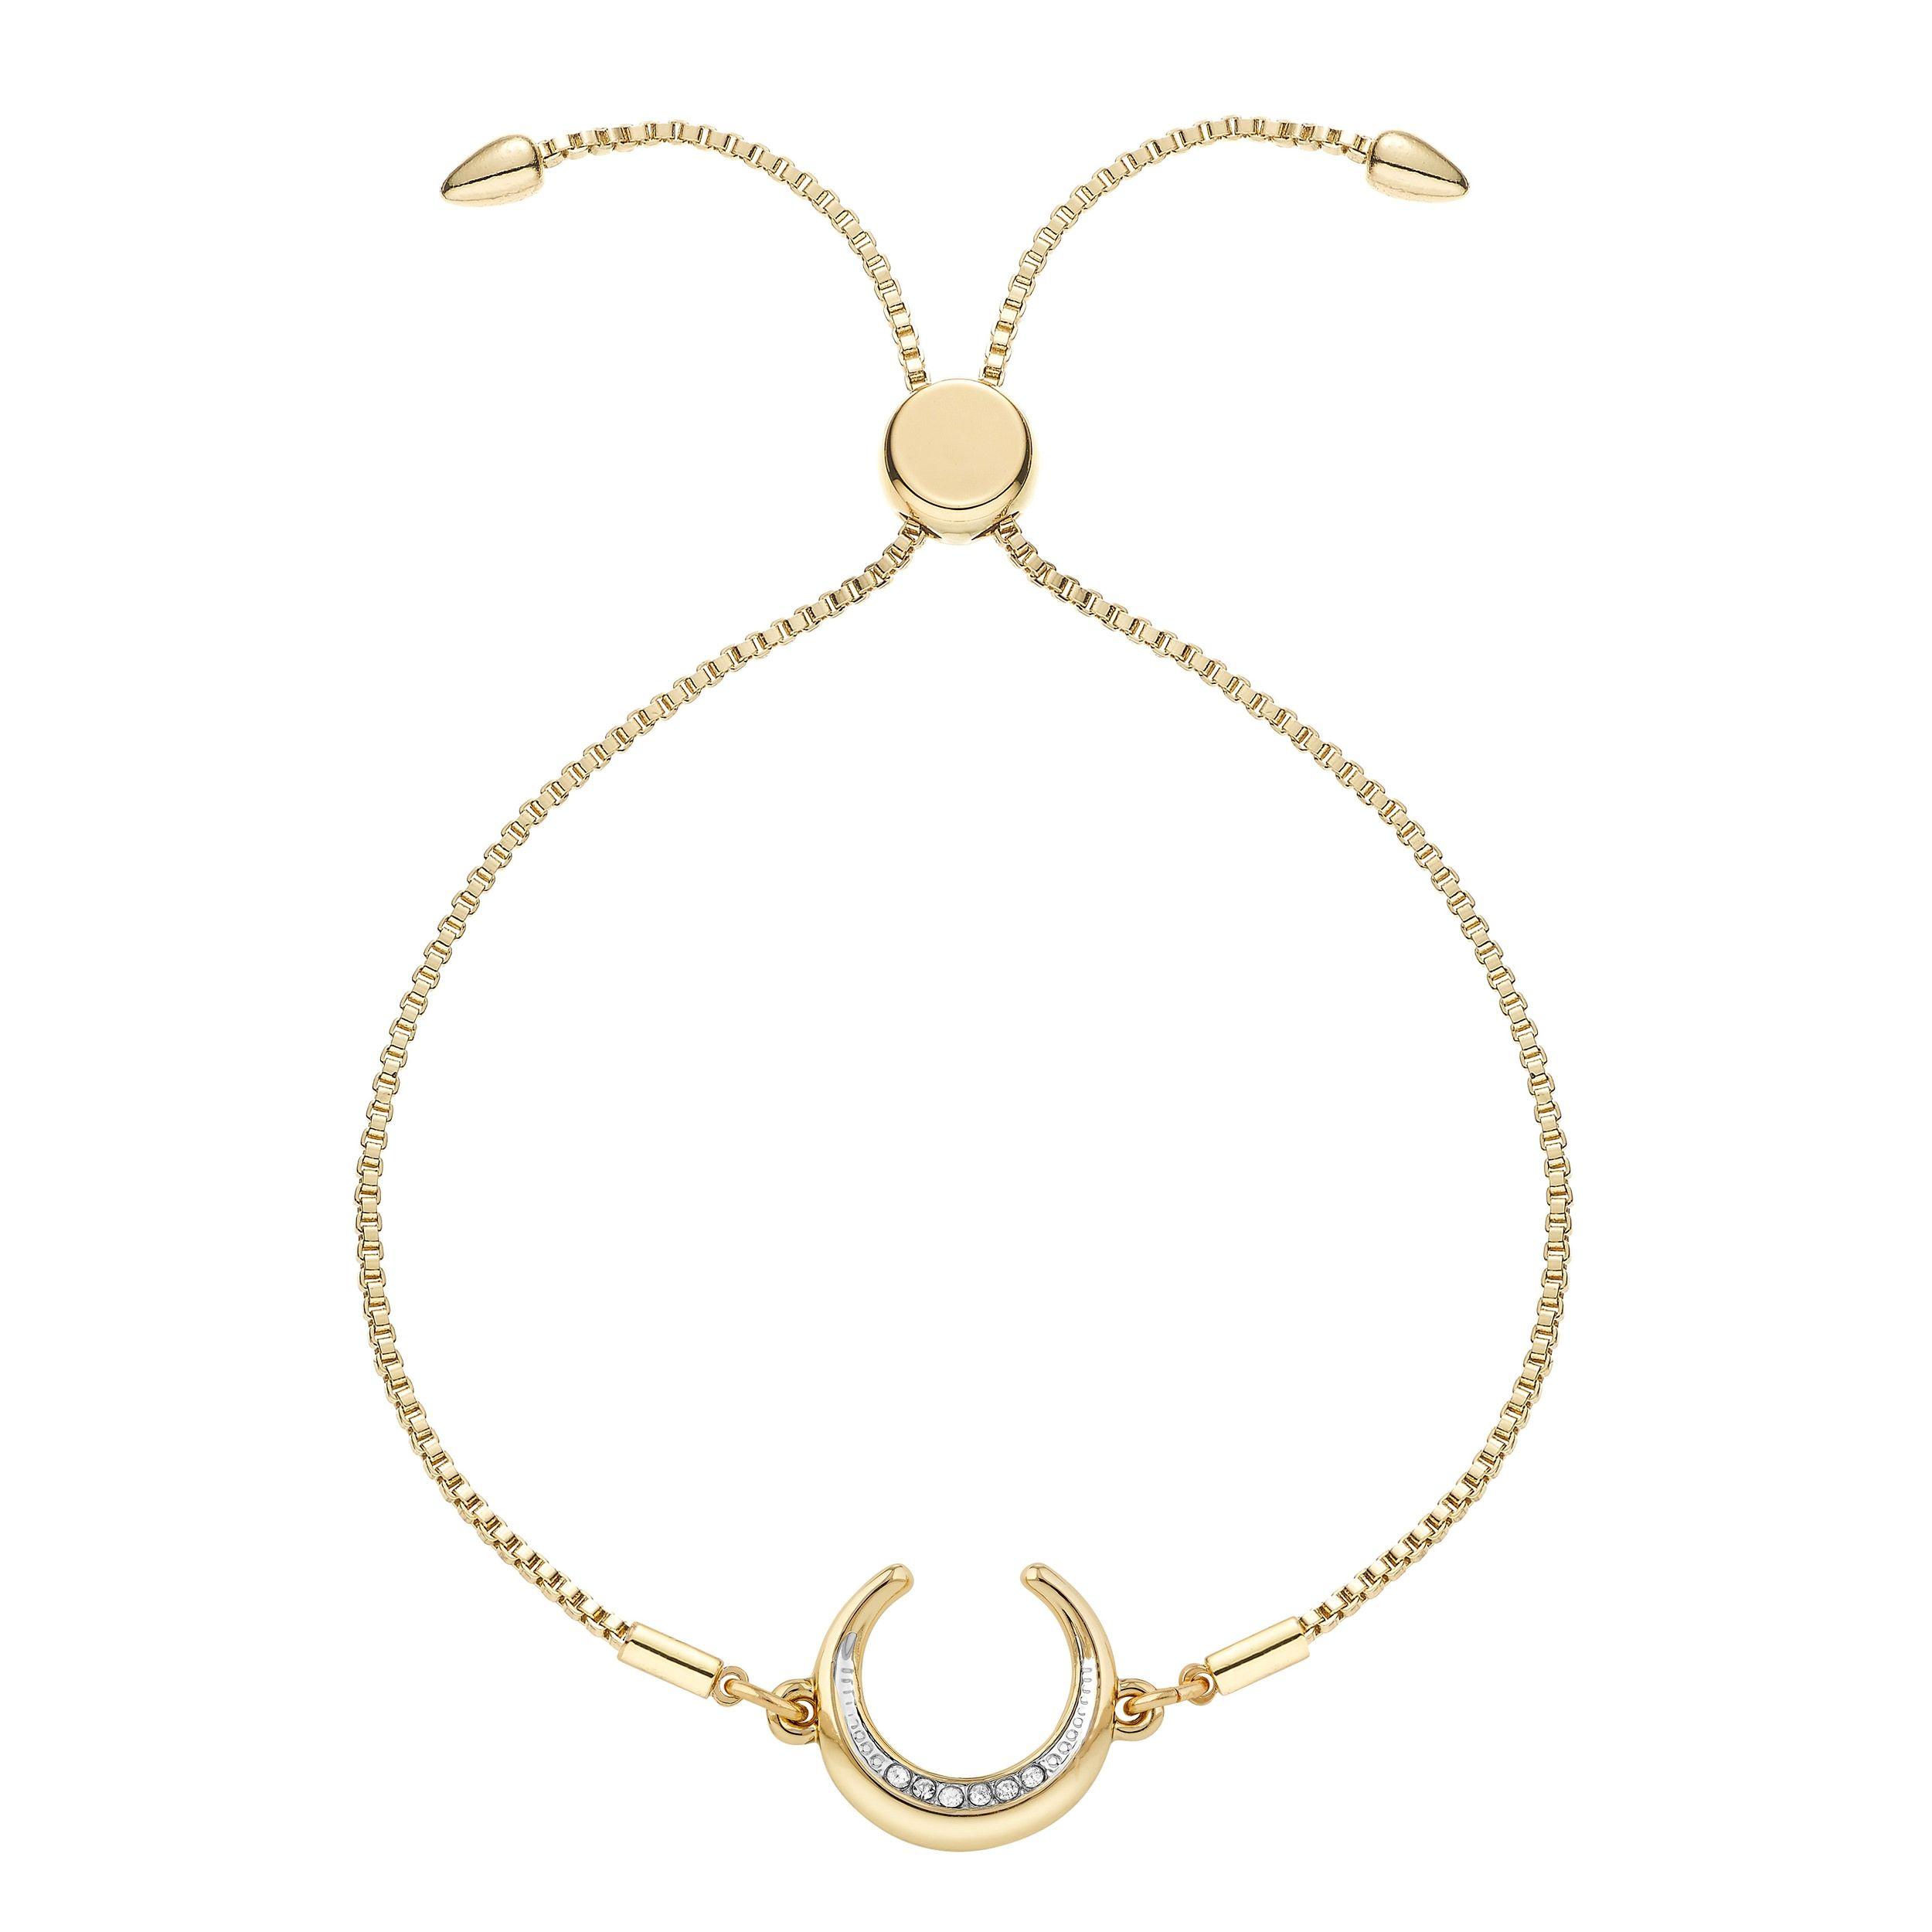 Buckley London Moonlight Bracelet